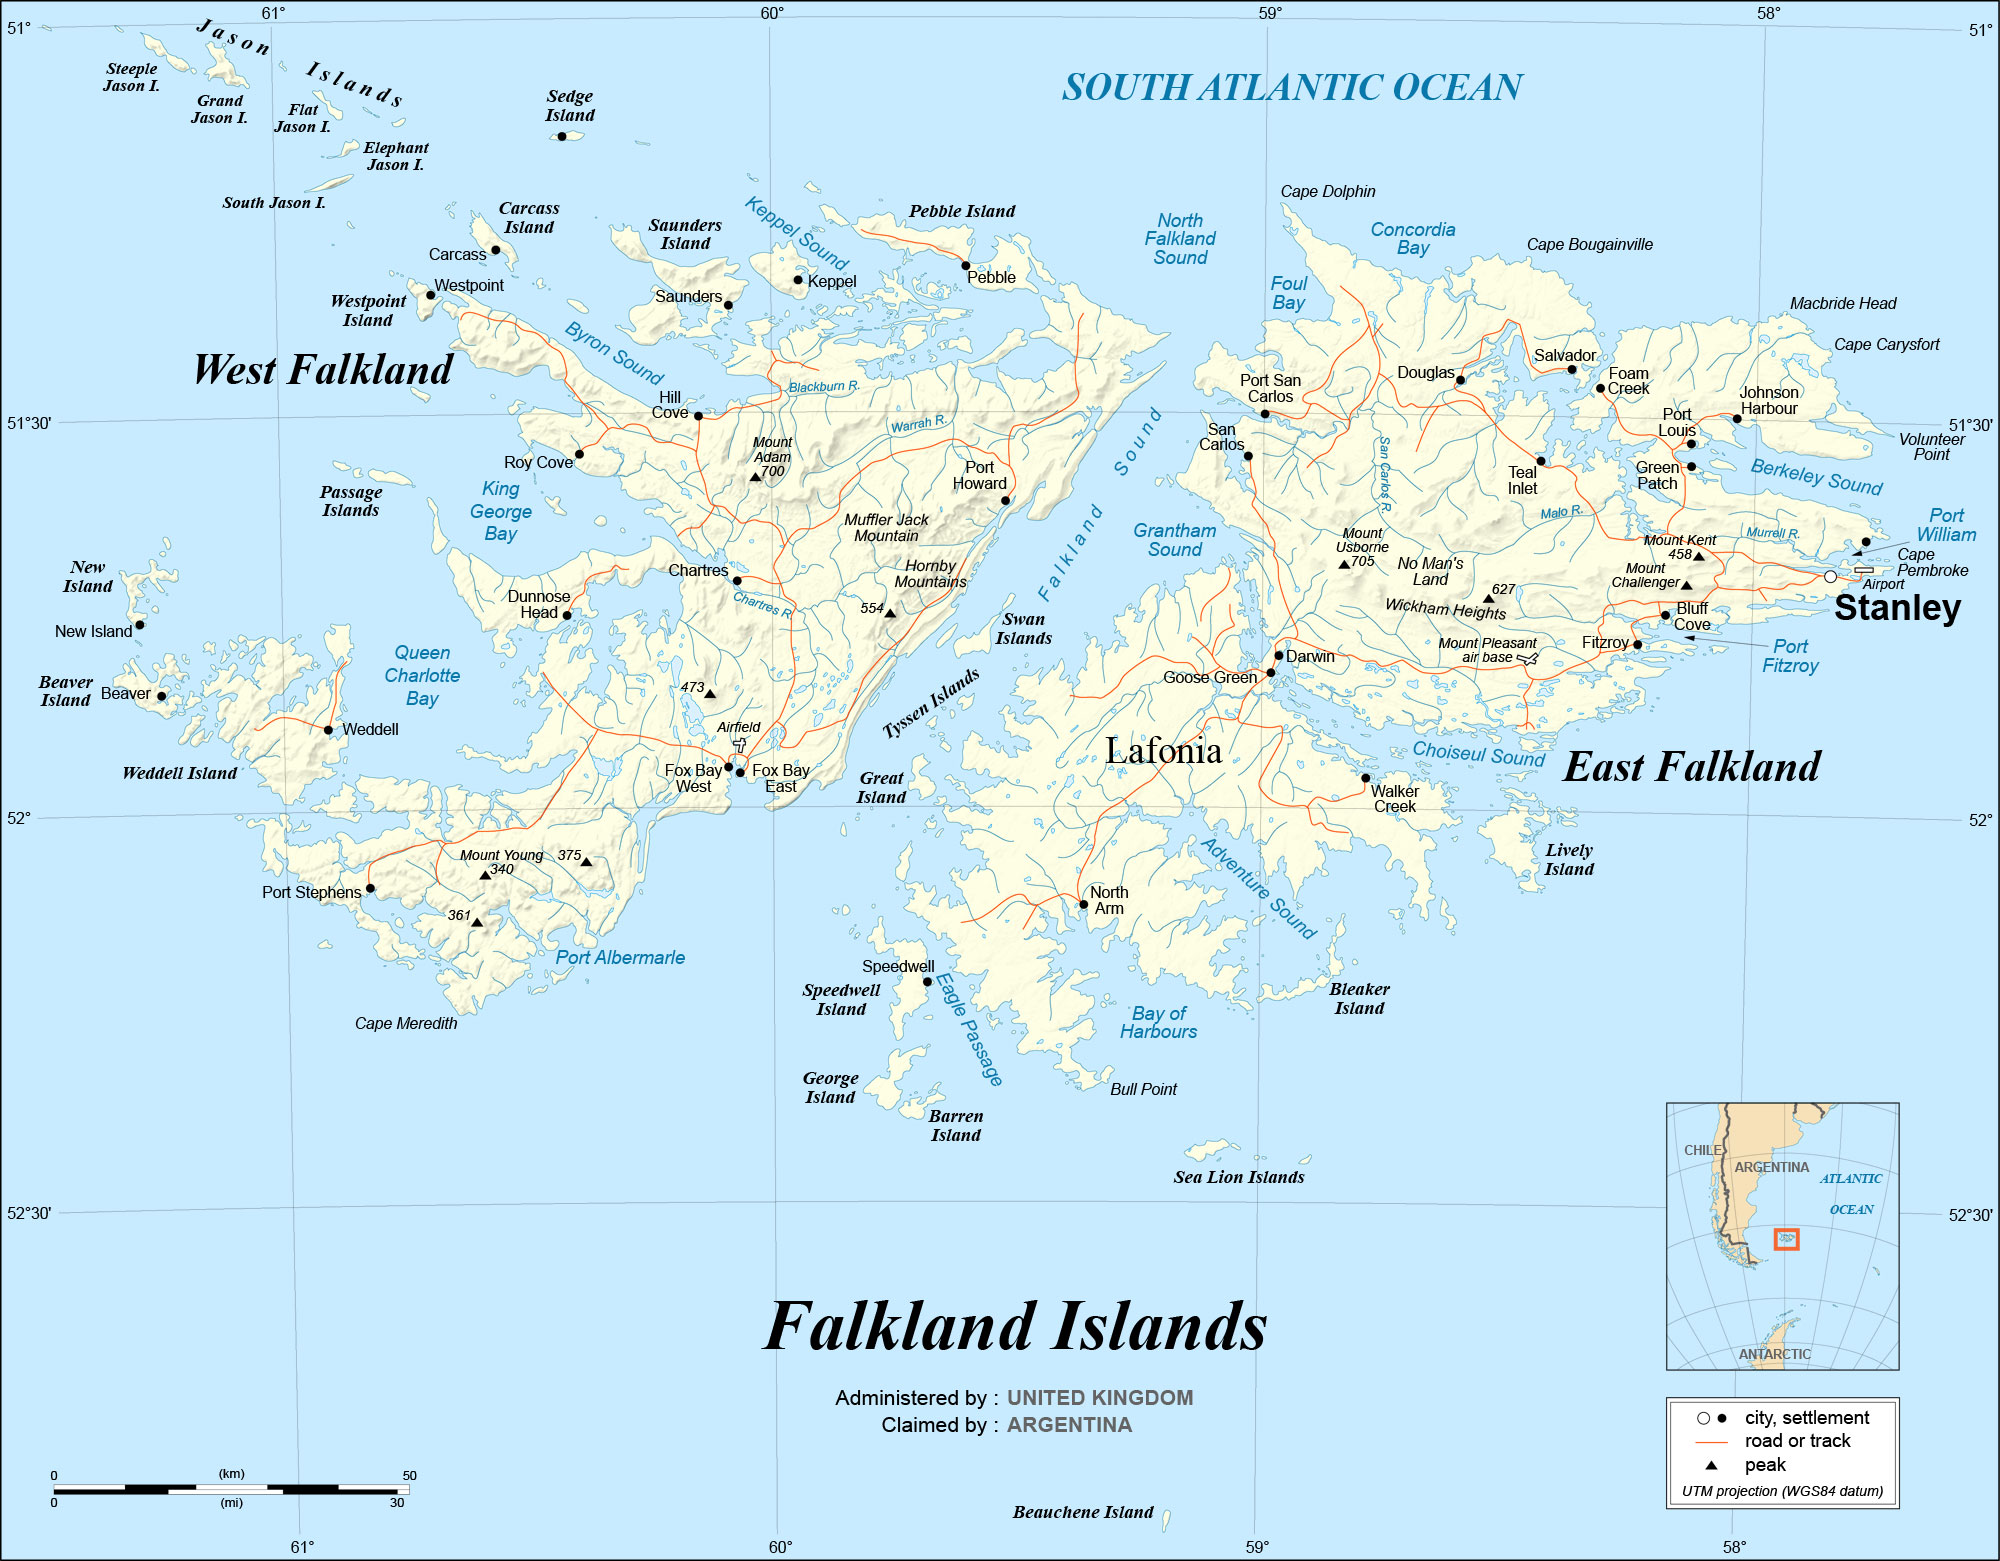 Falkland_Islands_map_shaded_relief-en